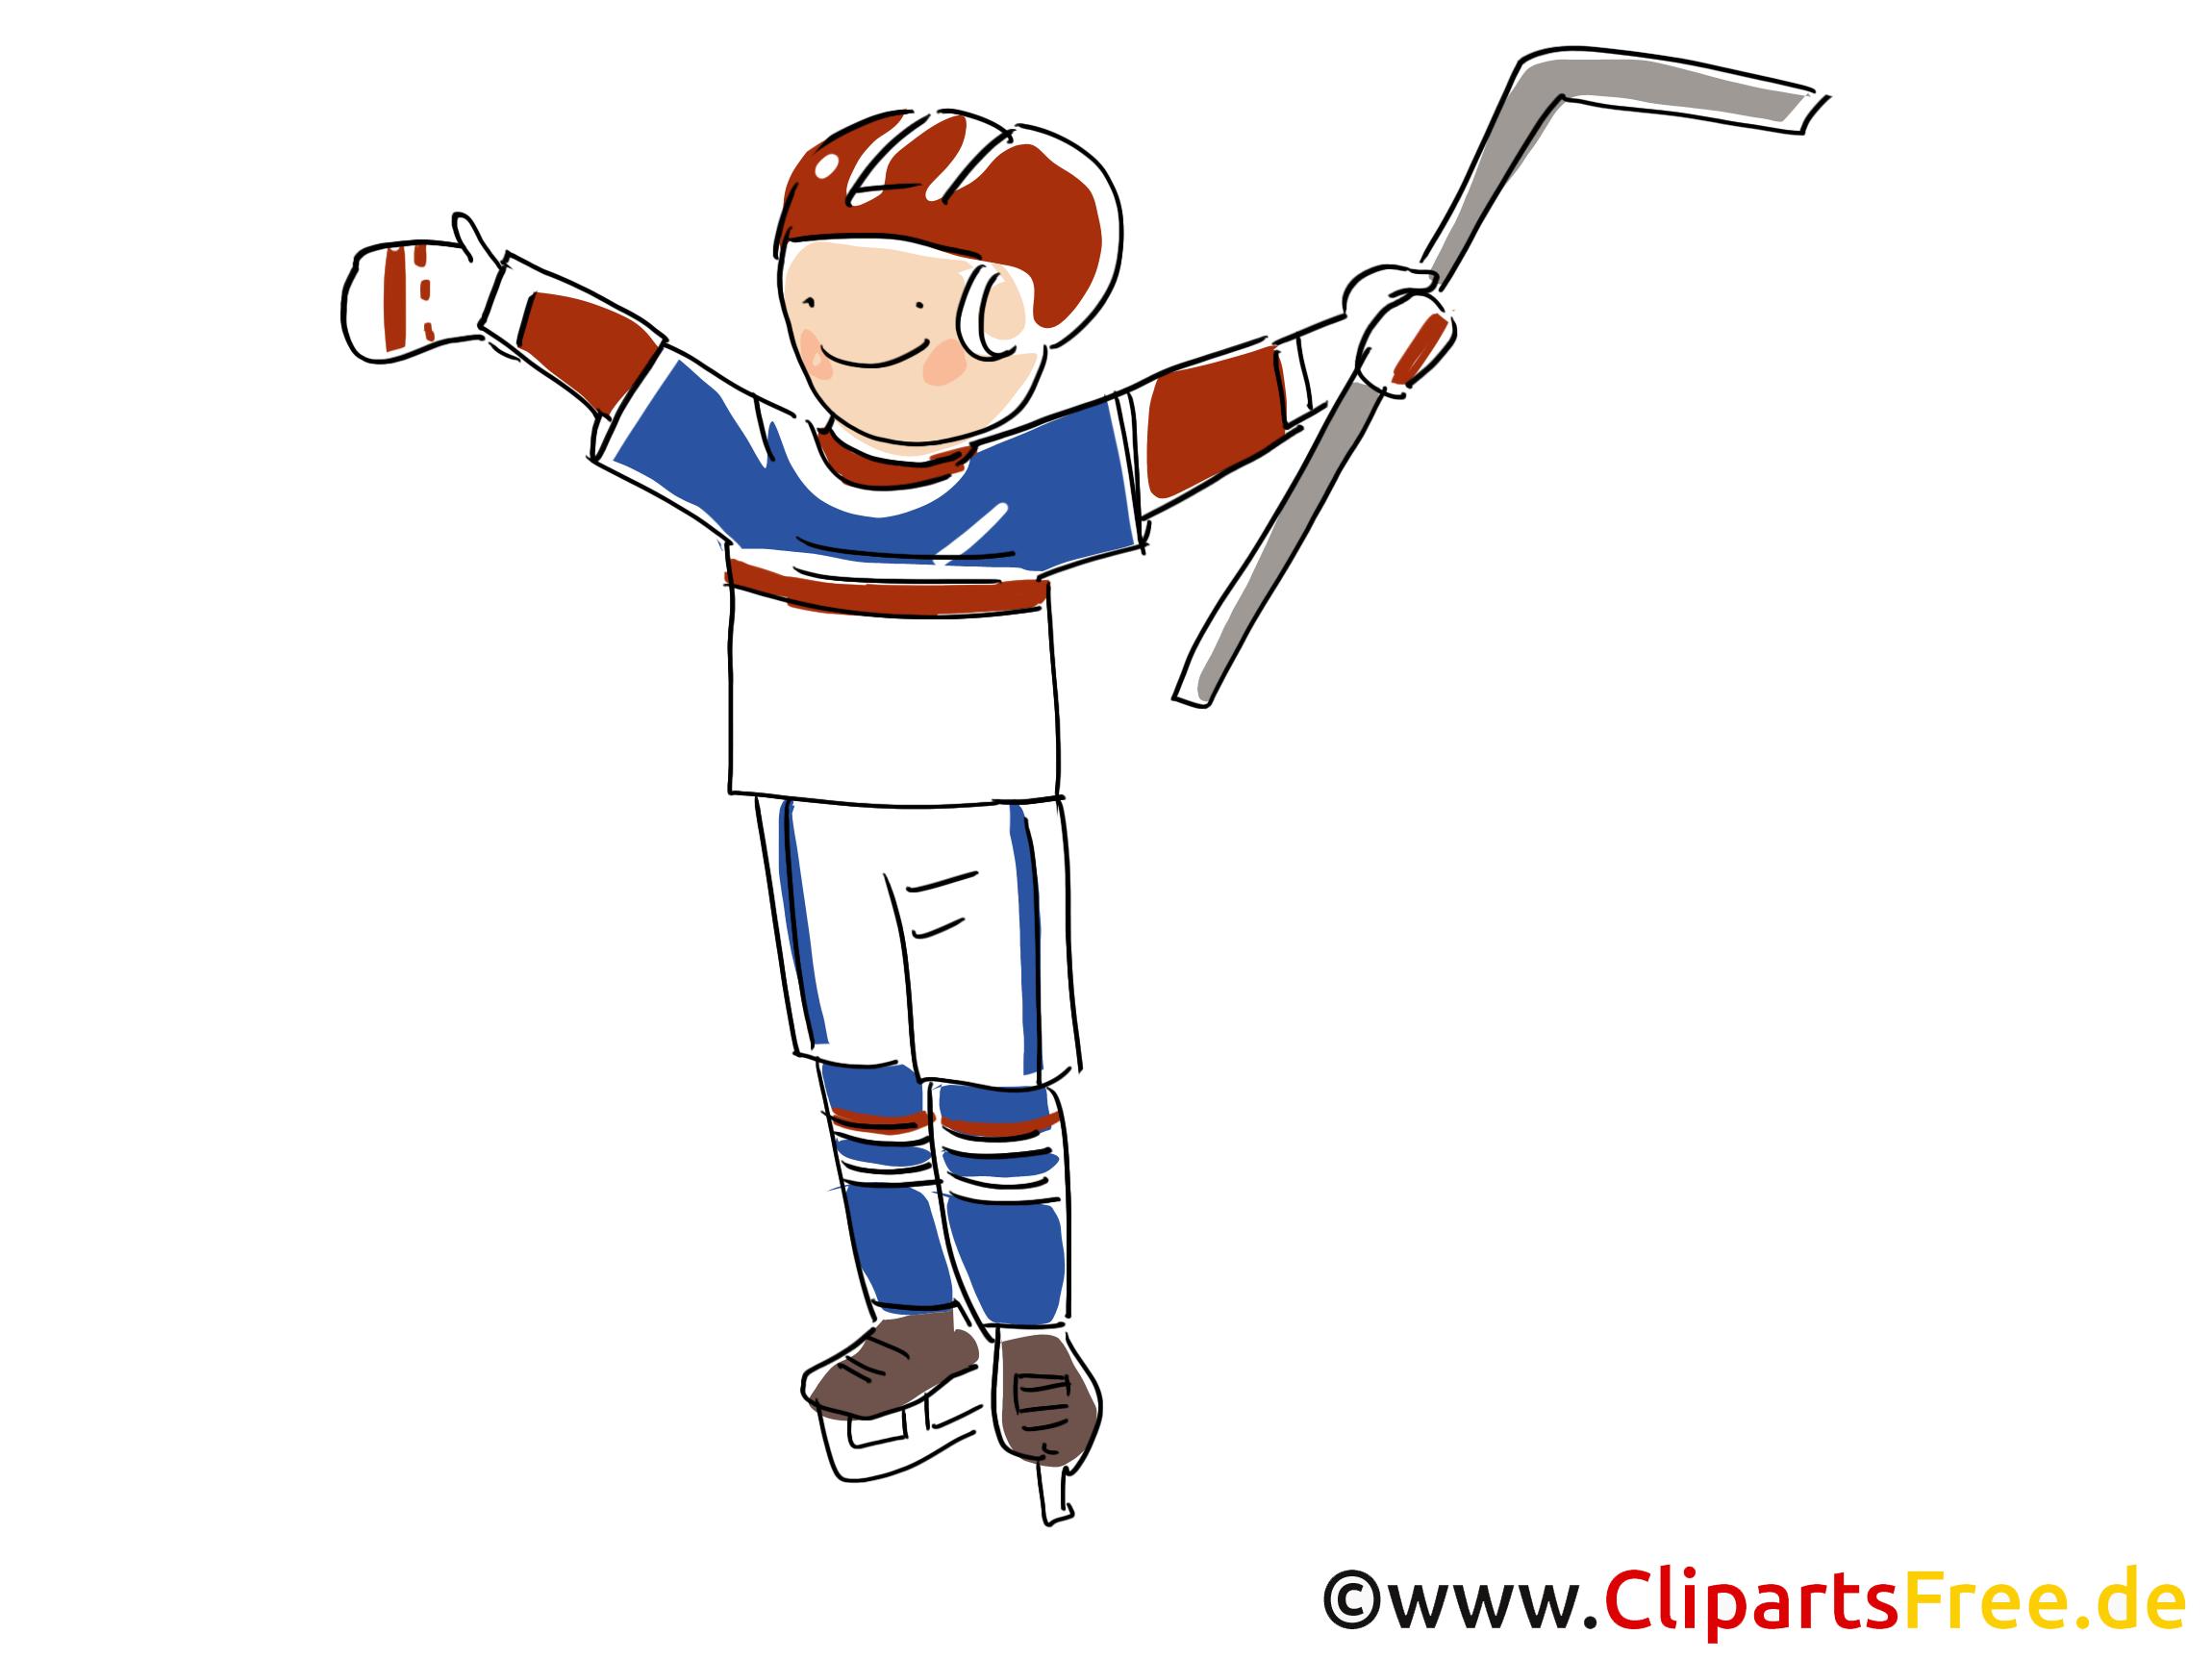 Vainqueur image - Hockey images cliparts